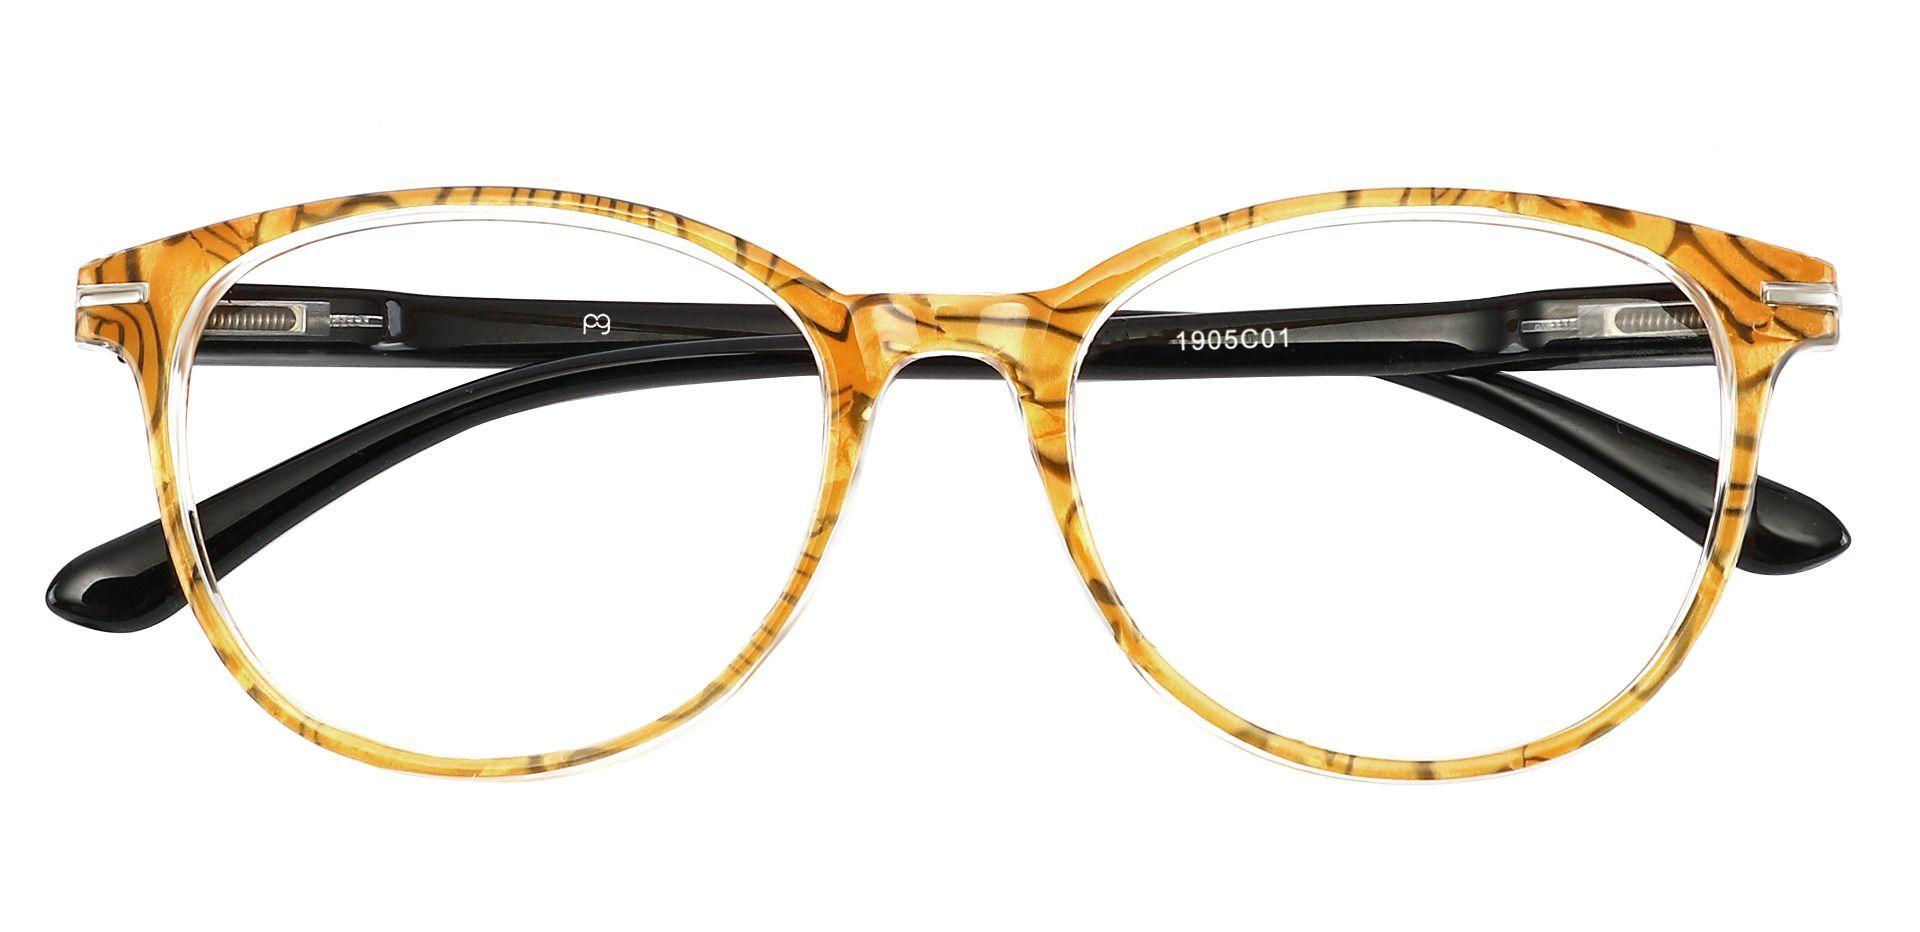 Benton Oval Progressive Glasses - Tortoise